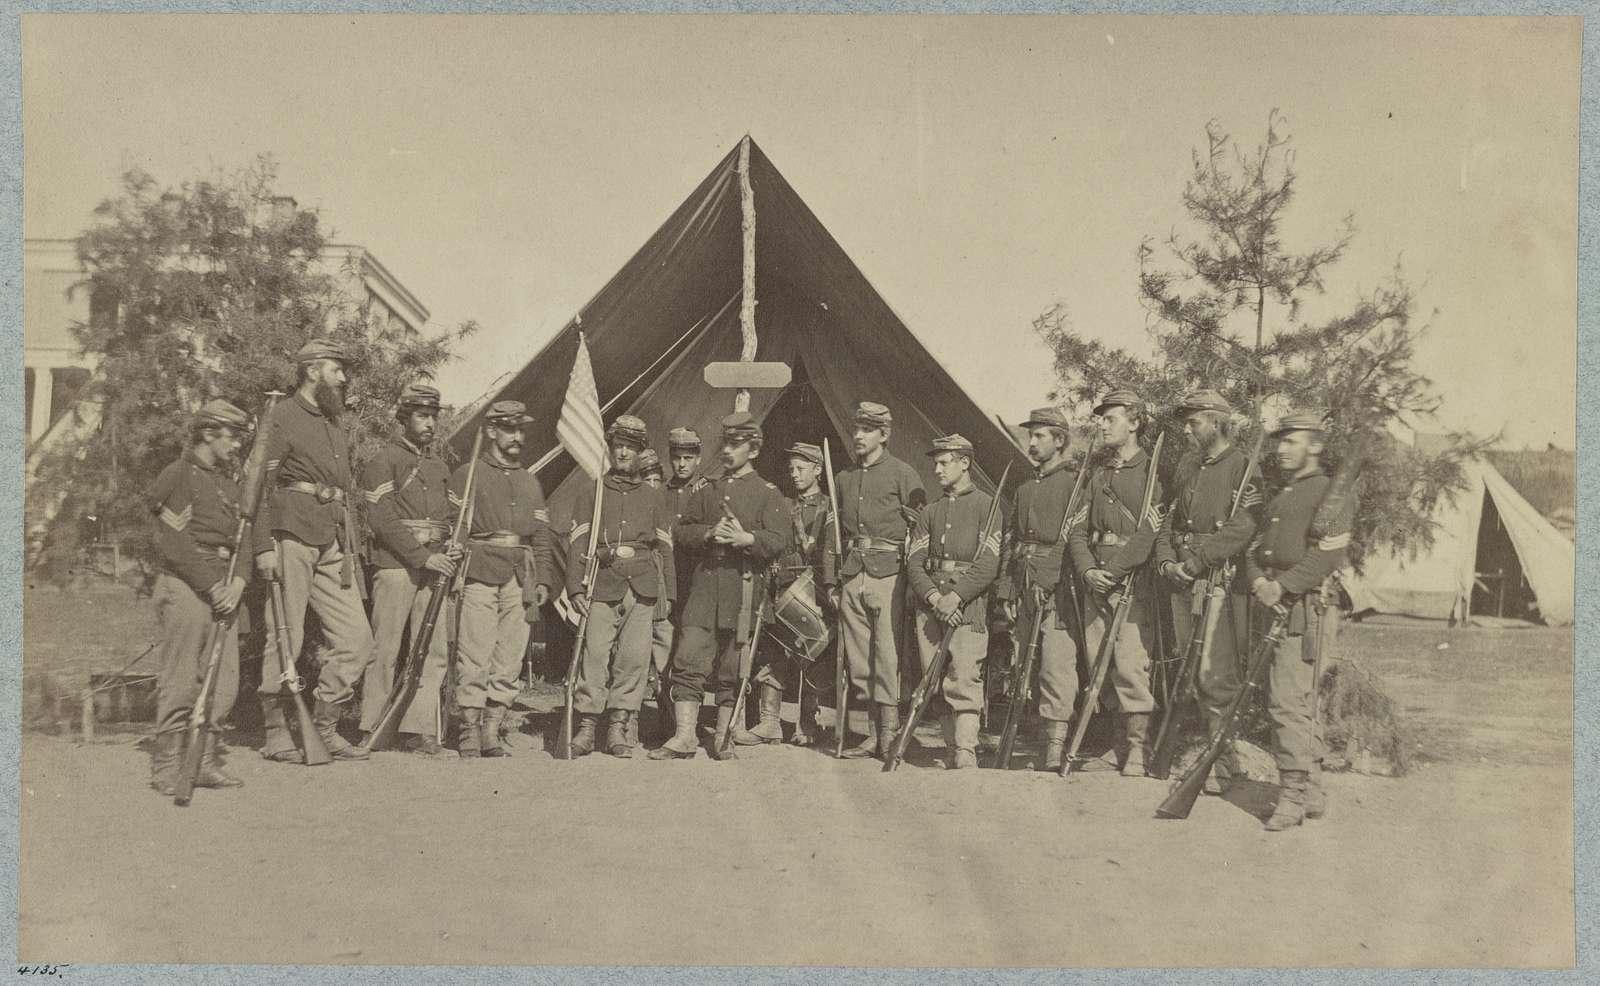 Adjutant and First Sergeants, 22d N. Y. S. M. near Harper's Ferry, Va.1861 (i.e.1862?)